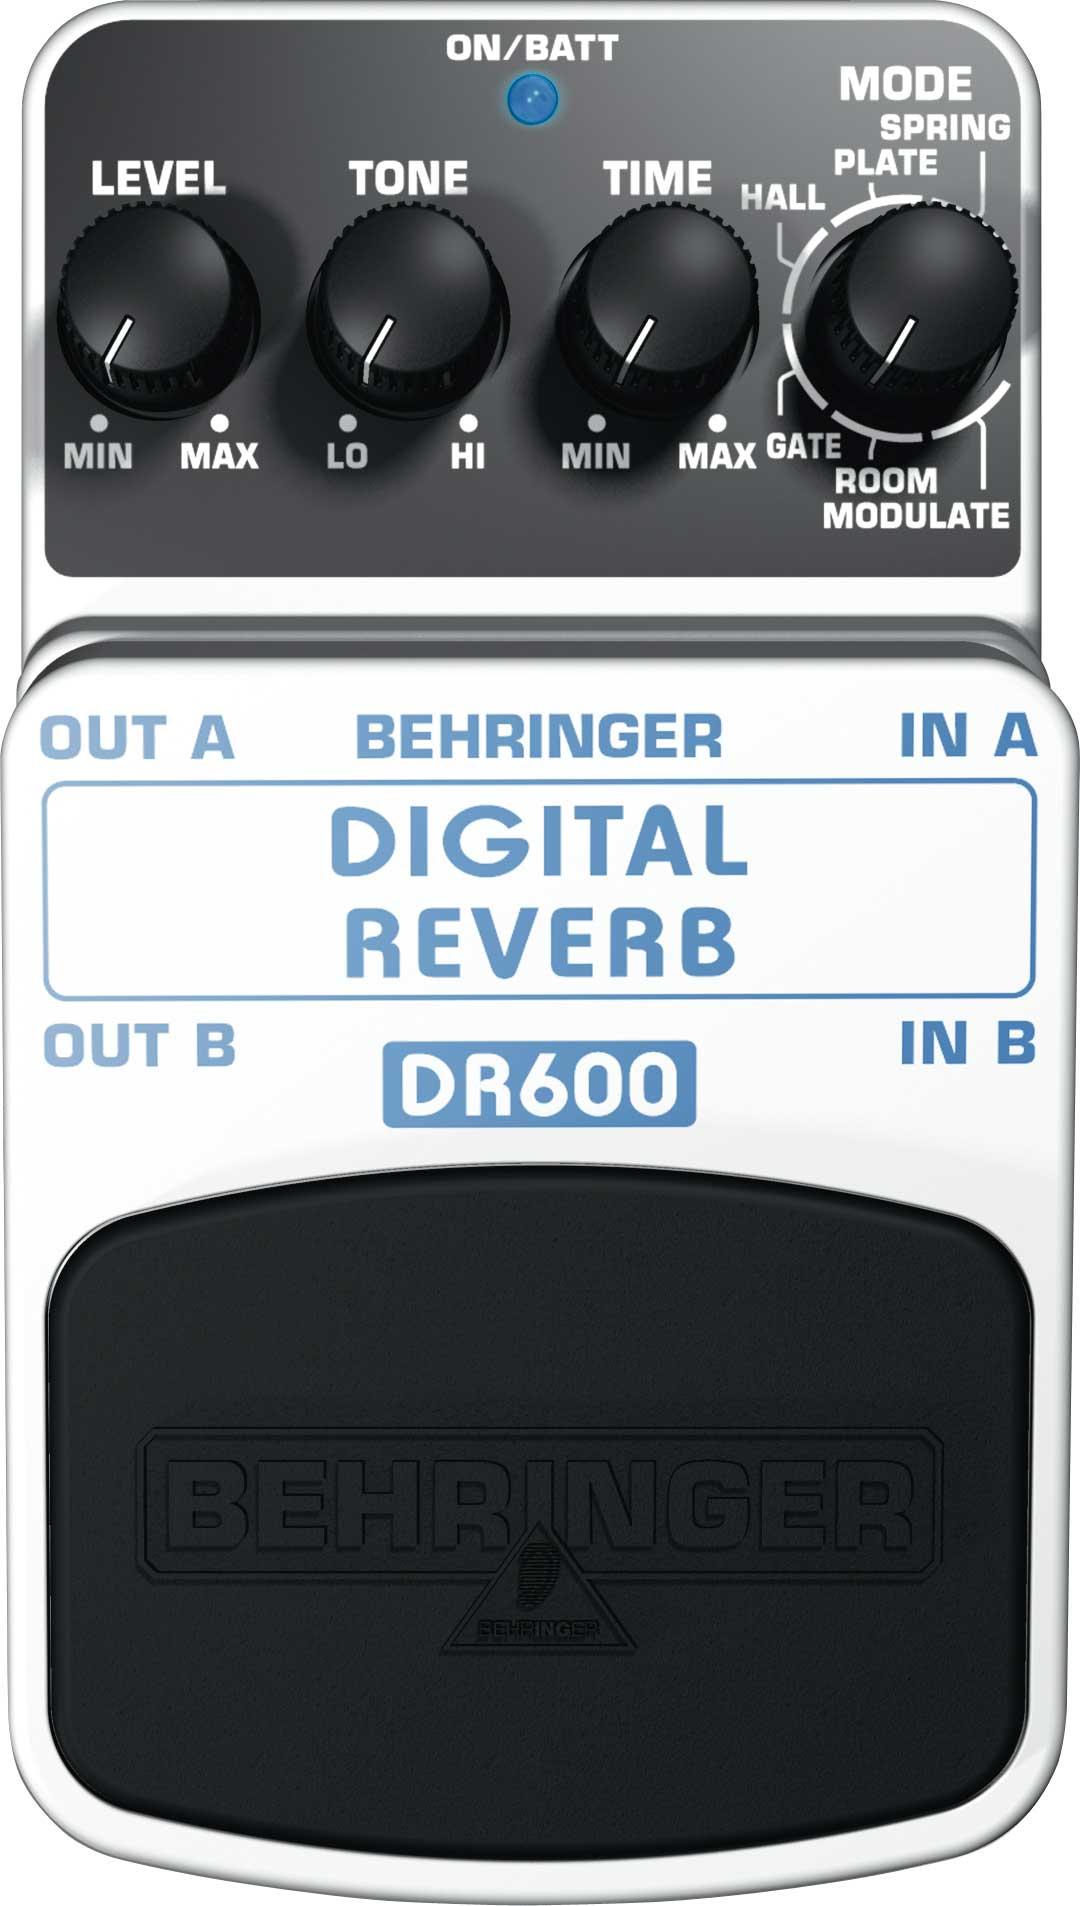 Behringer DR600-REVERB Digital Stereo Reverb Effects Guitar Pedal DR600-REVERB